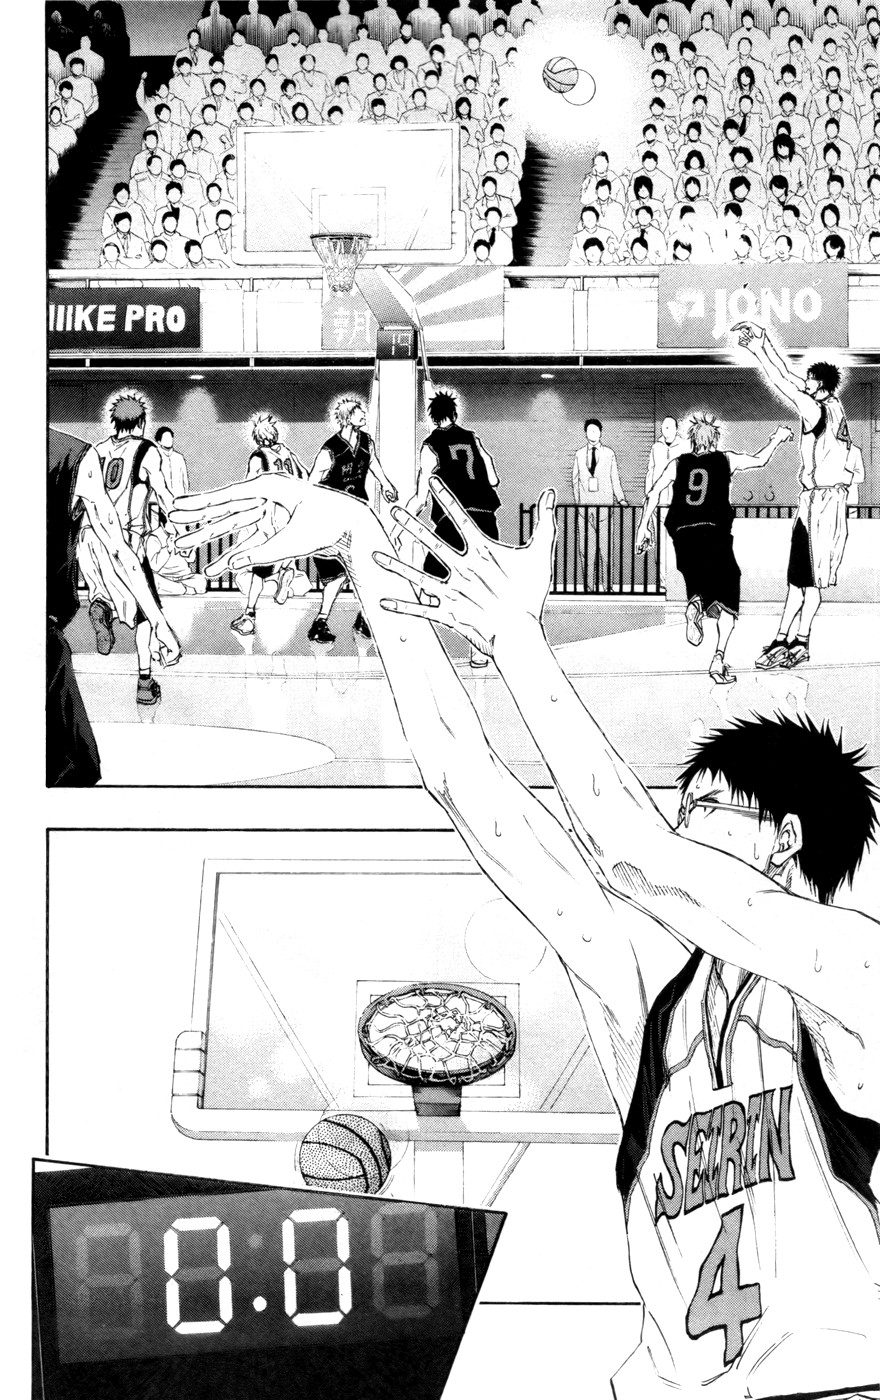 Kuroko no Basket Manga Chapter 118 - Image 4_024